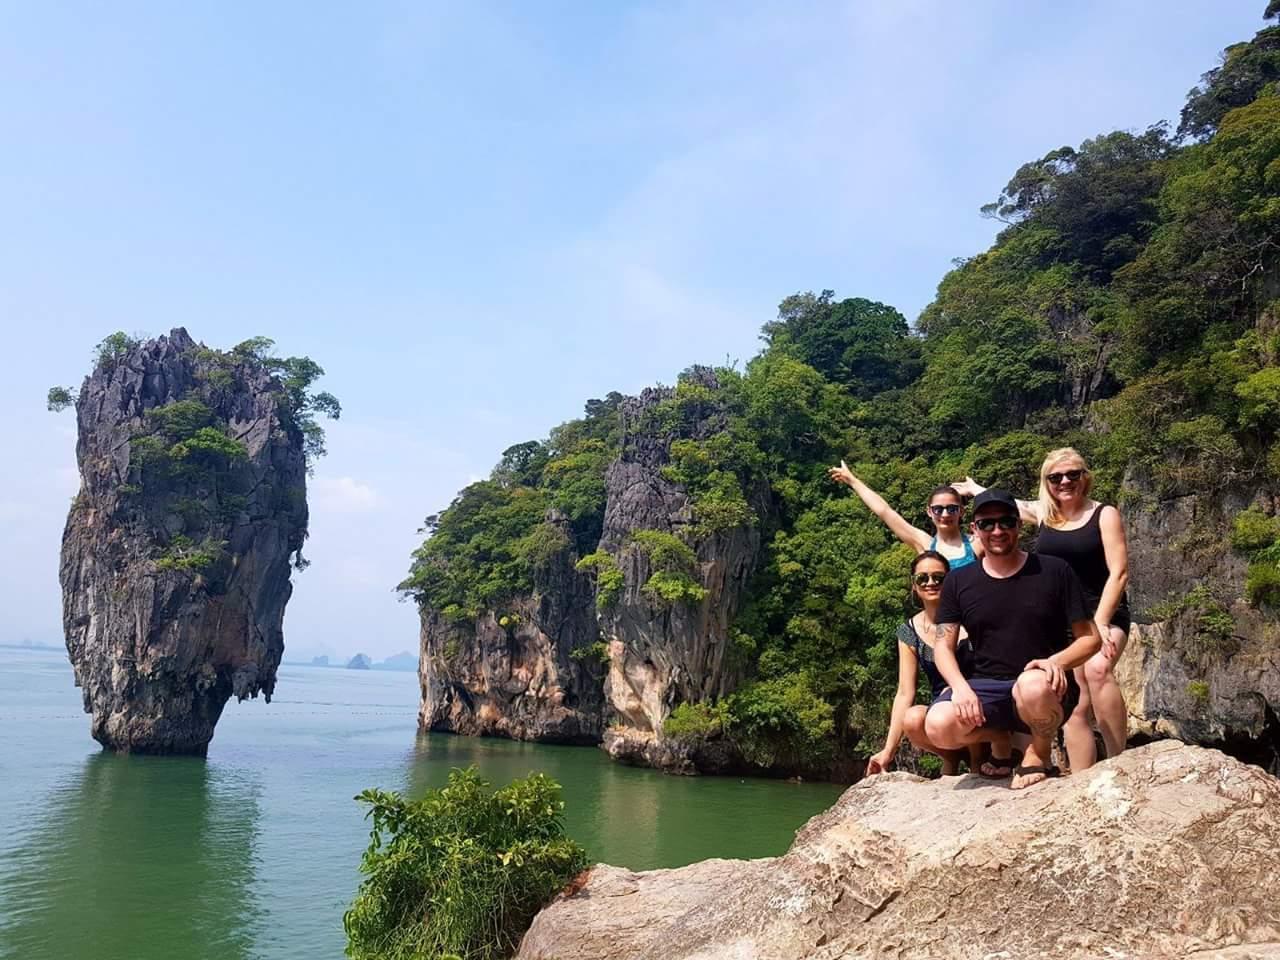 ⭐️⭐️⭐️⭐️⭐️ James Bond Isla y Bahía de Phang Nga ⭐️⭐️⭐️⭐️⭐️